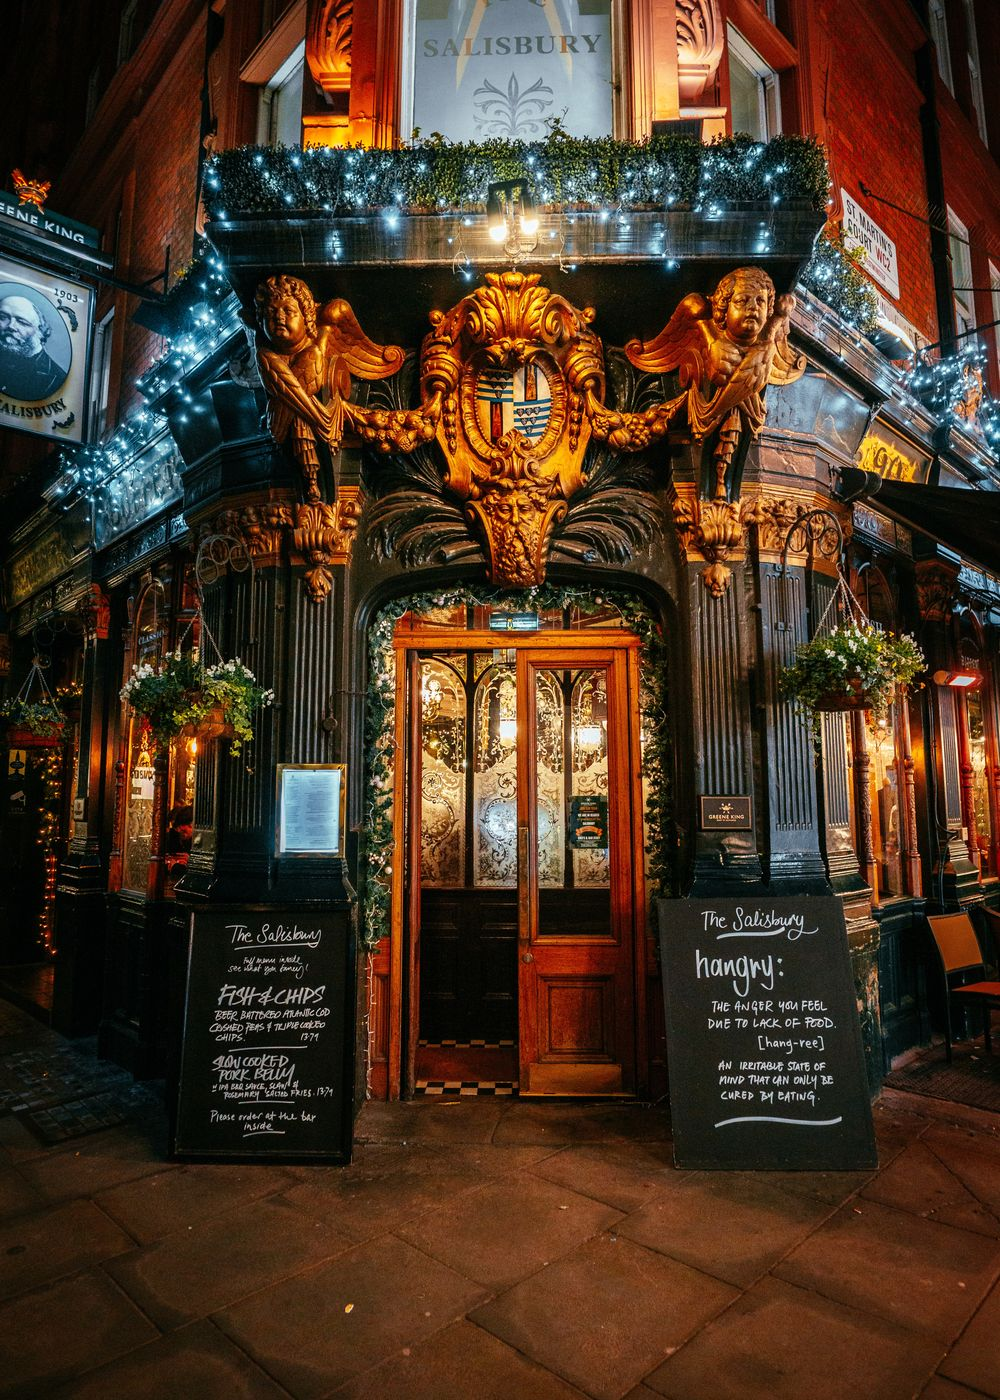 Pub with a wonderful Victorian interior